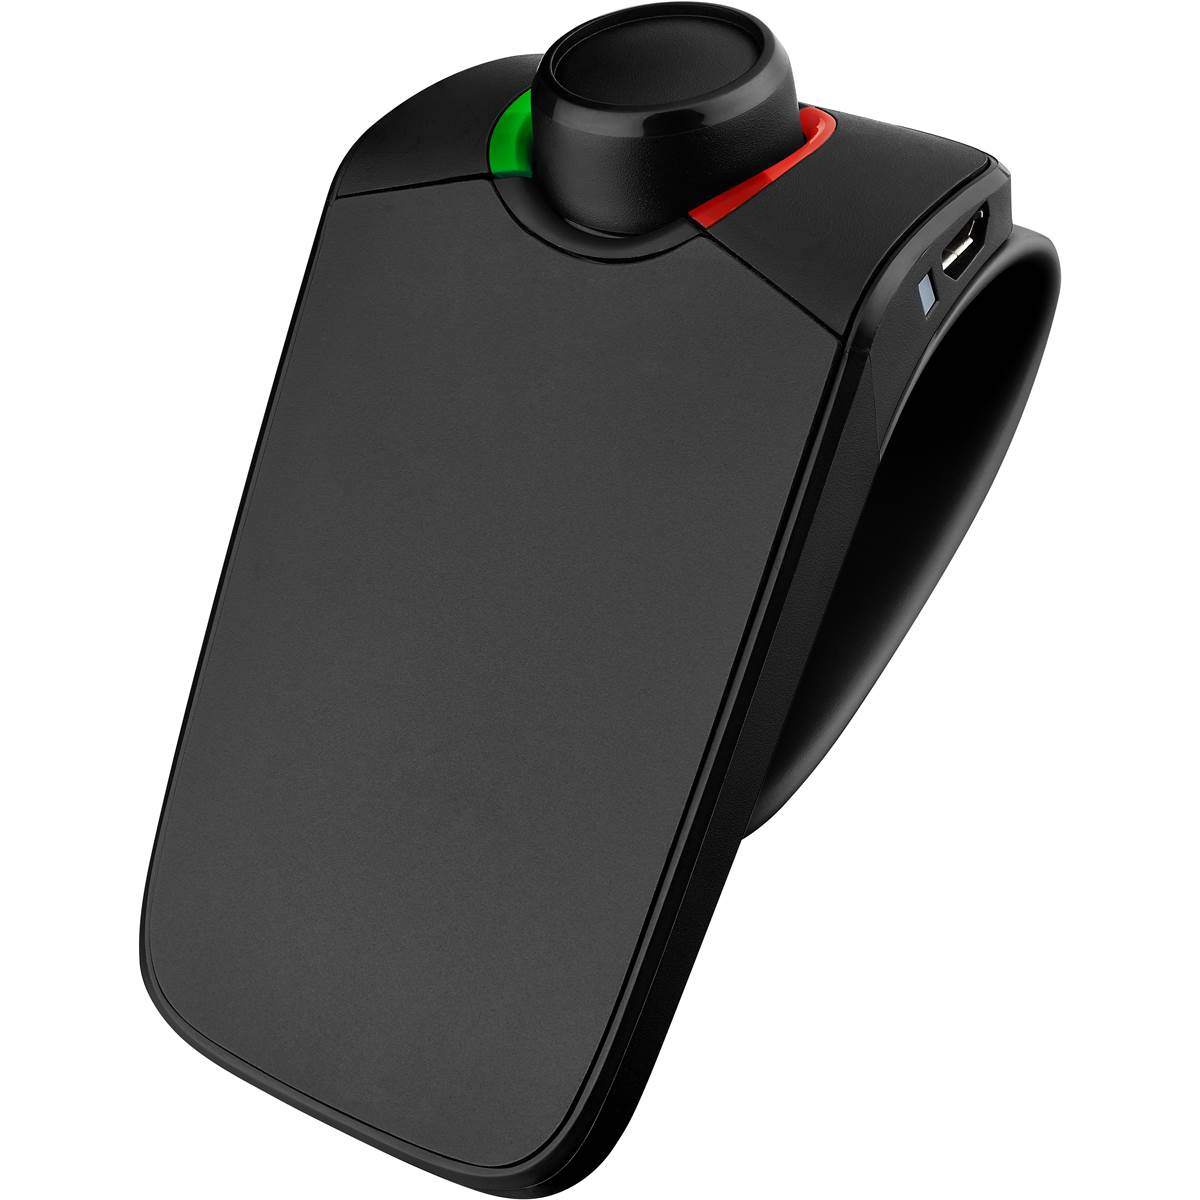 Kit mains-libres Bluetooth® Parrot Neo 2 HD - Noir